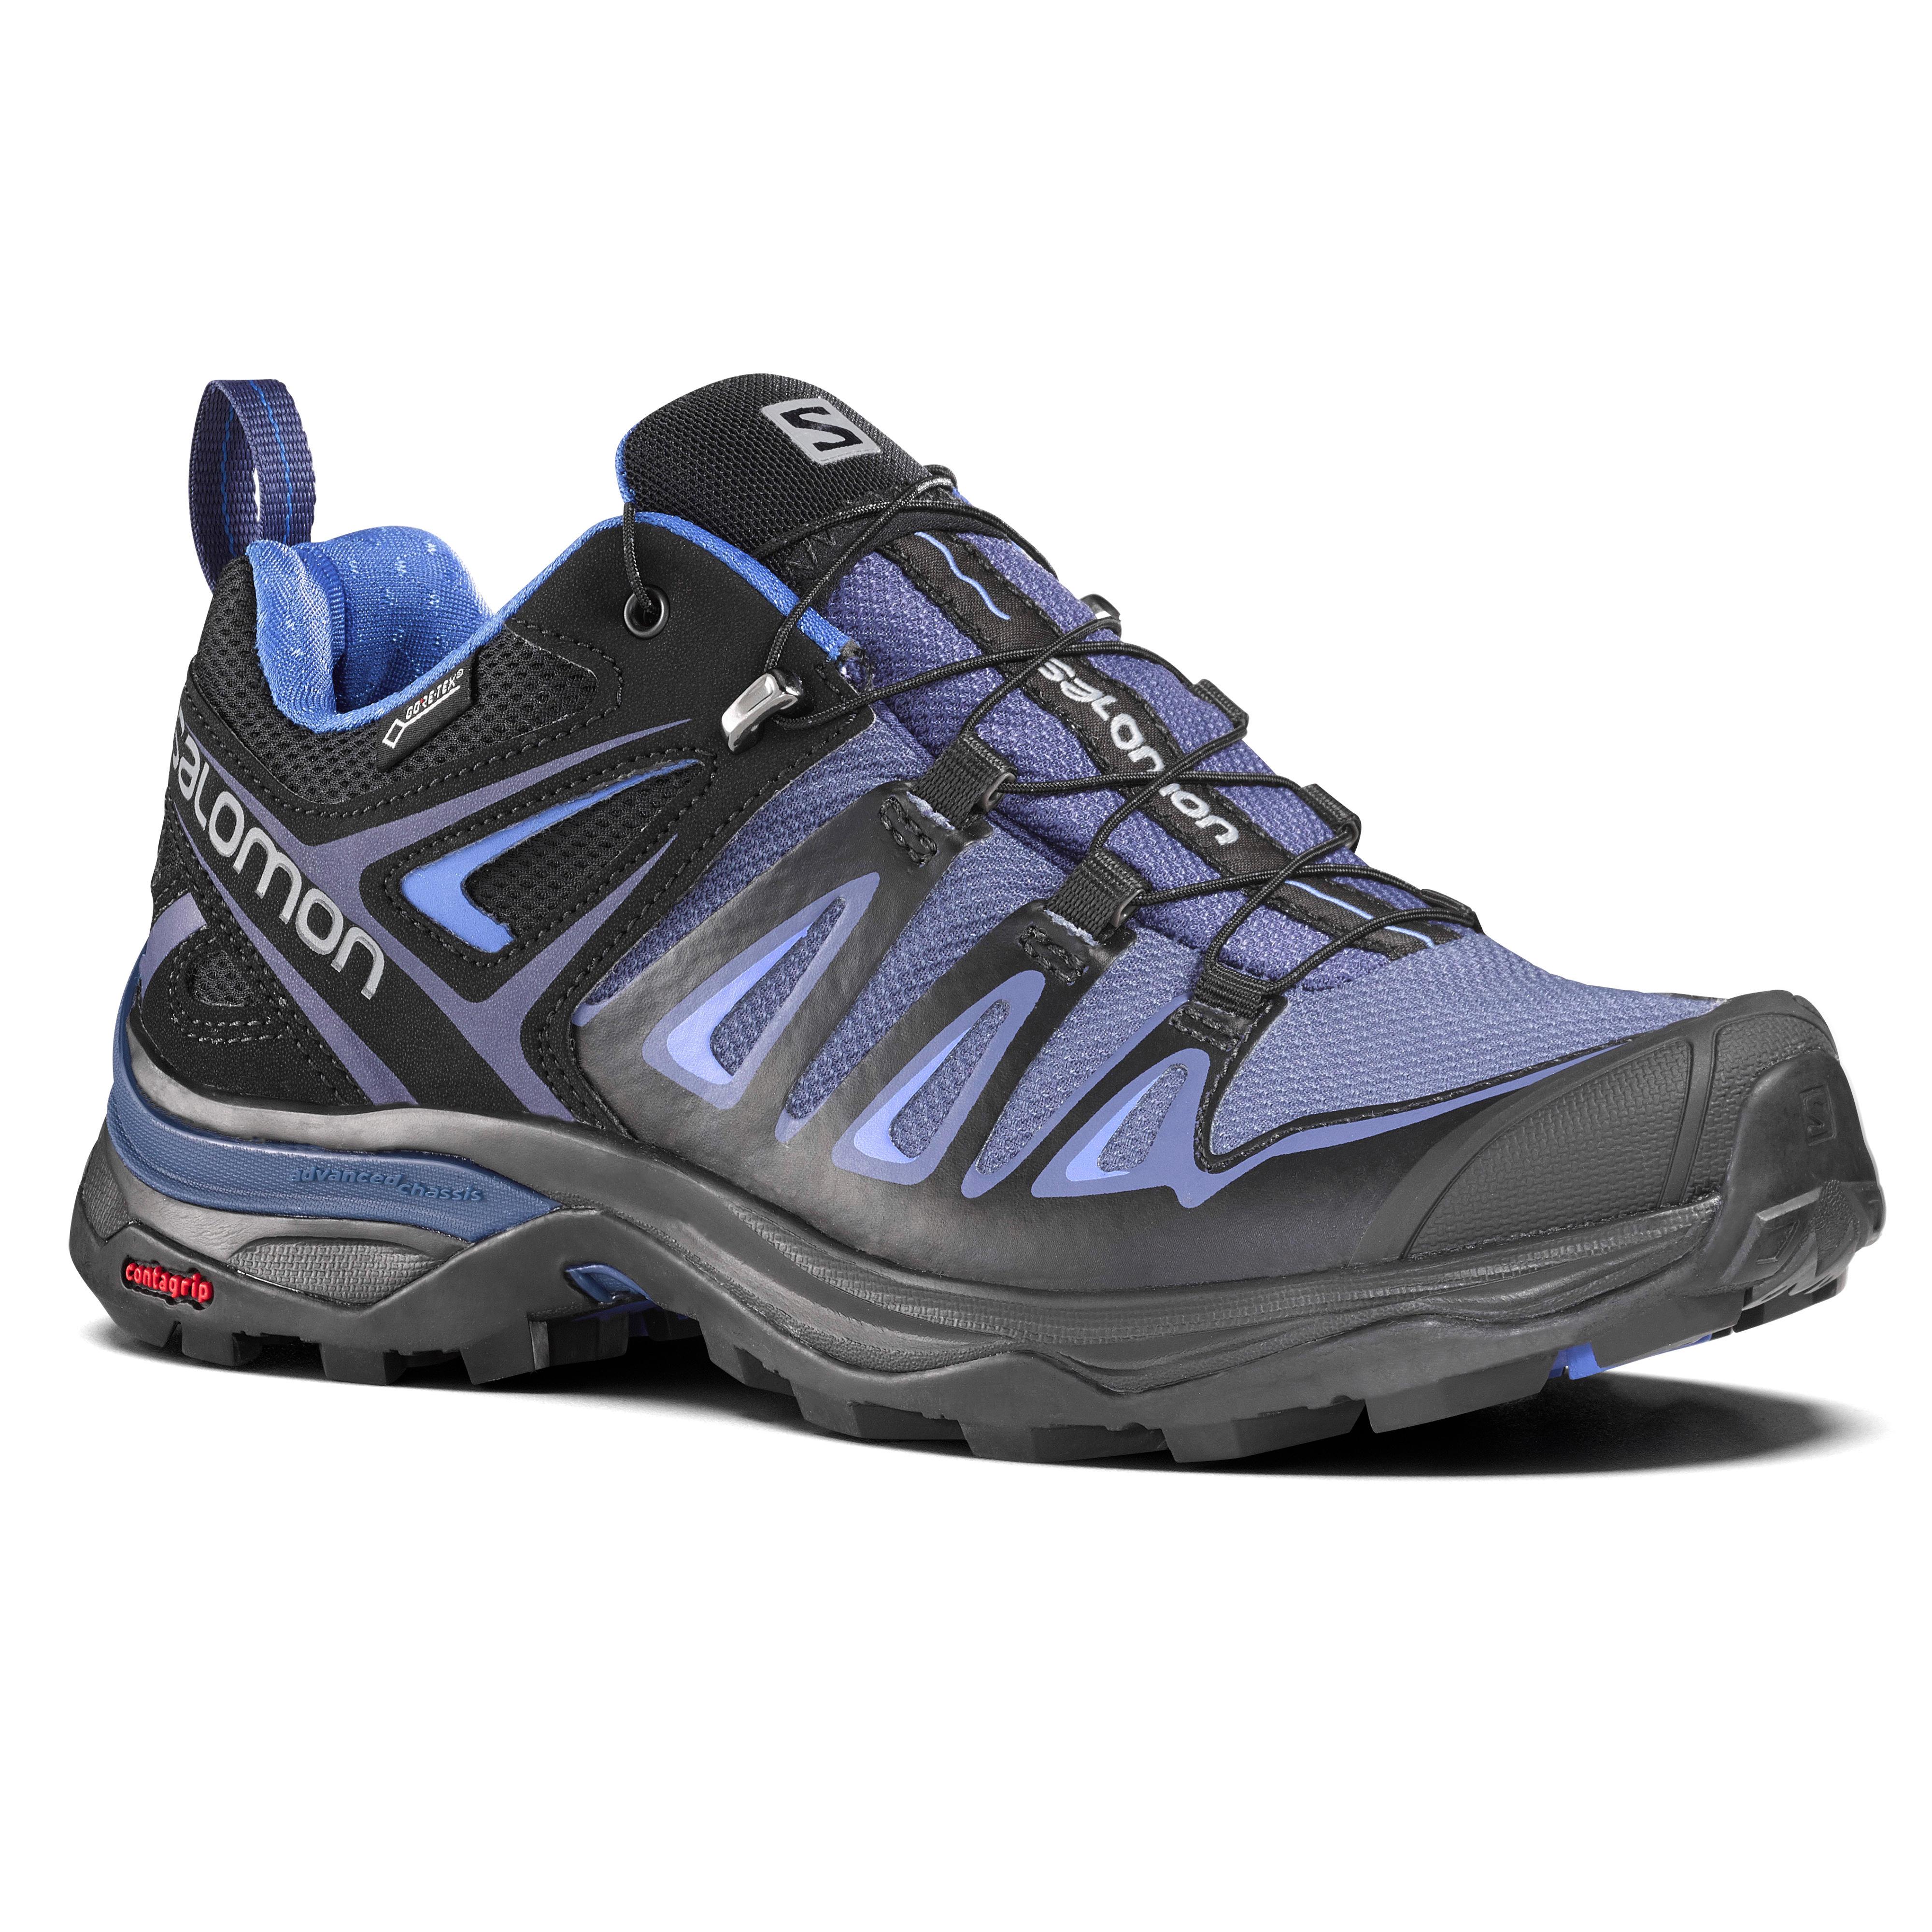 zapatos salomon para senderismo deportivo